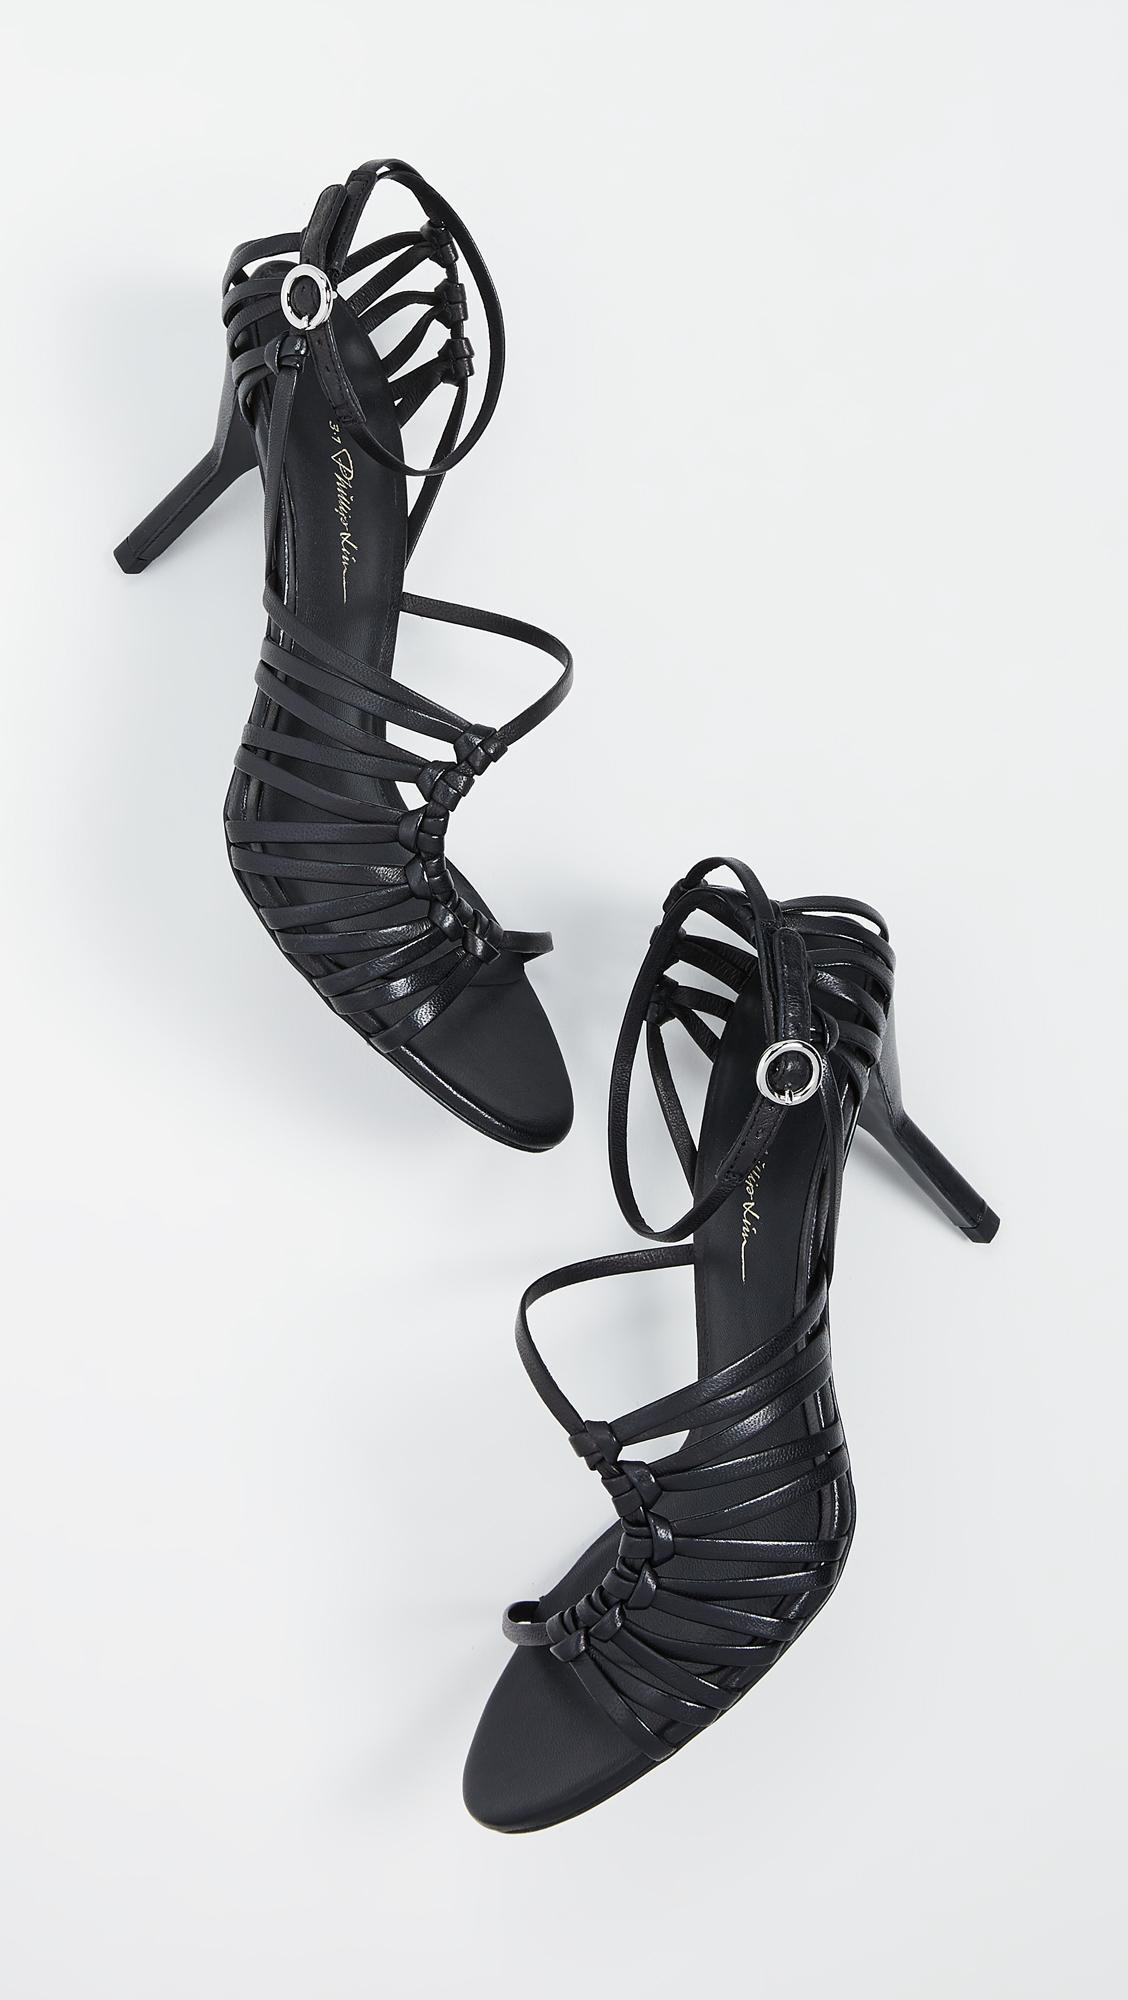 W2idhe9 3 Sandals Strappy Lim 75mm Black 1 Lily Phillip Lyst In CtQdhsr